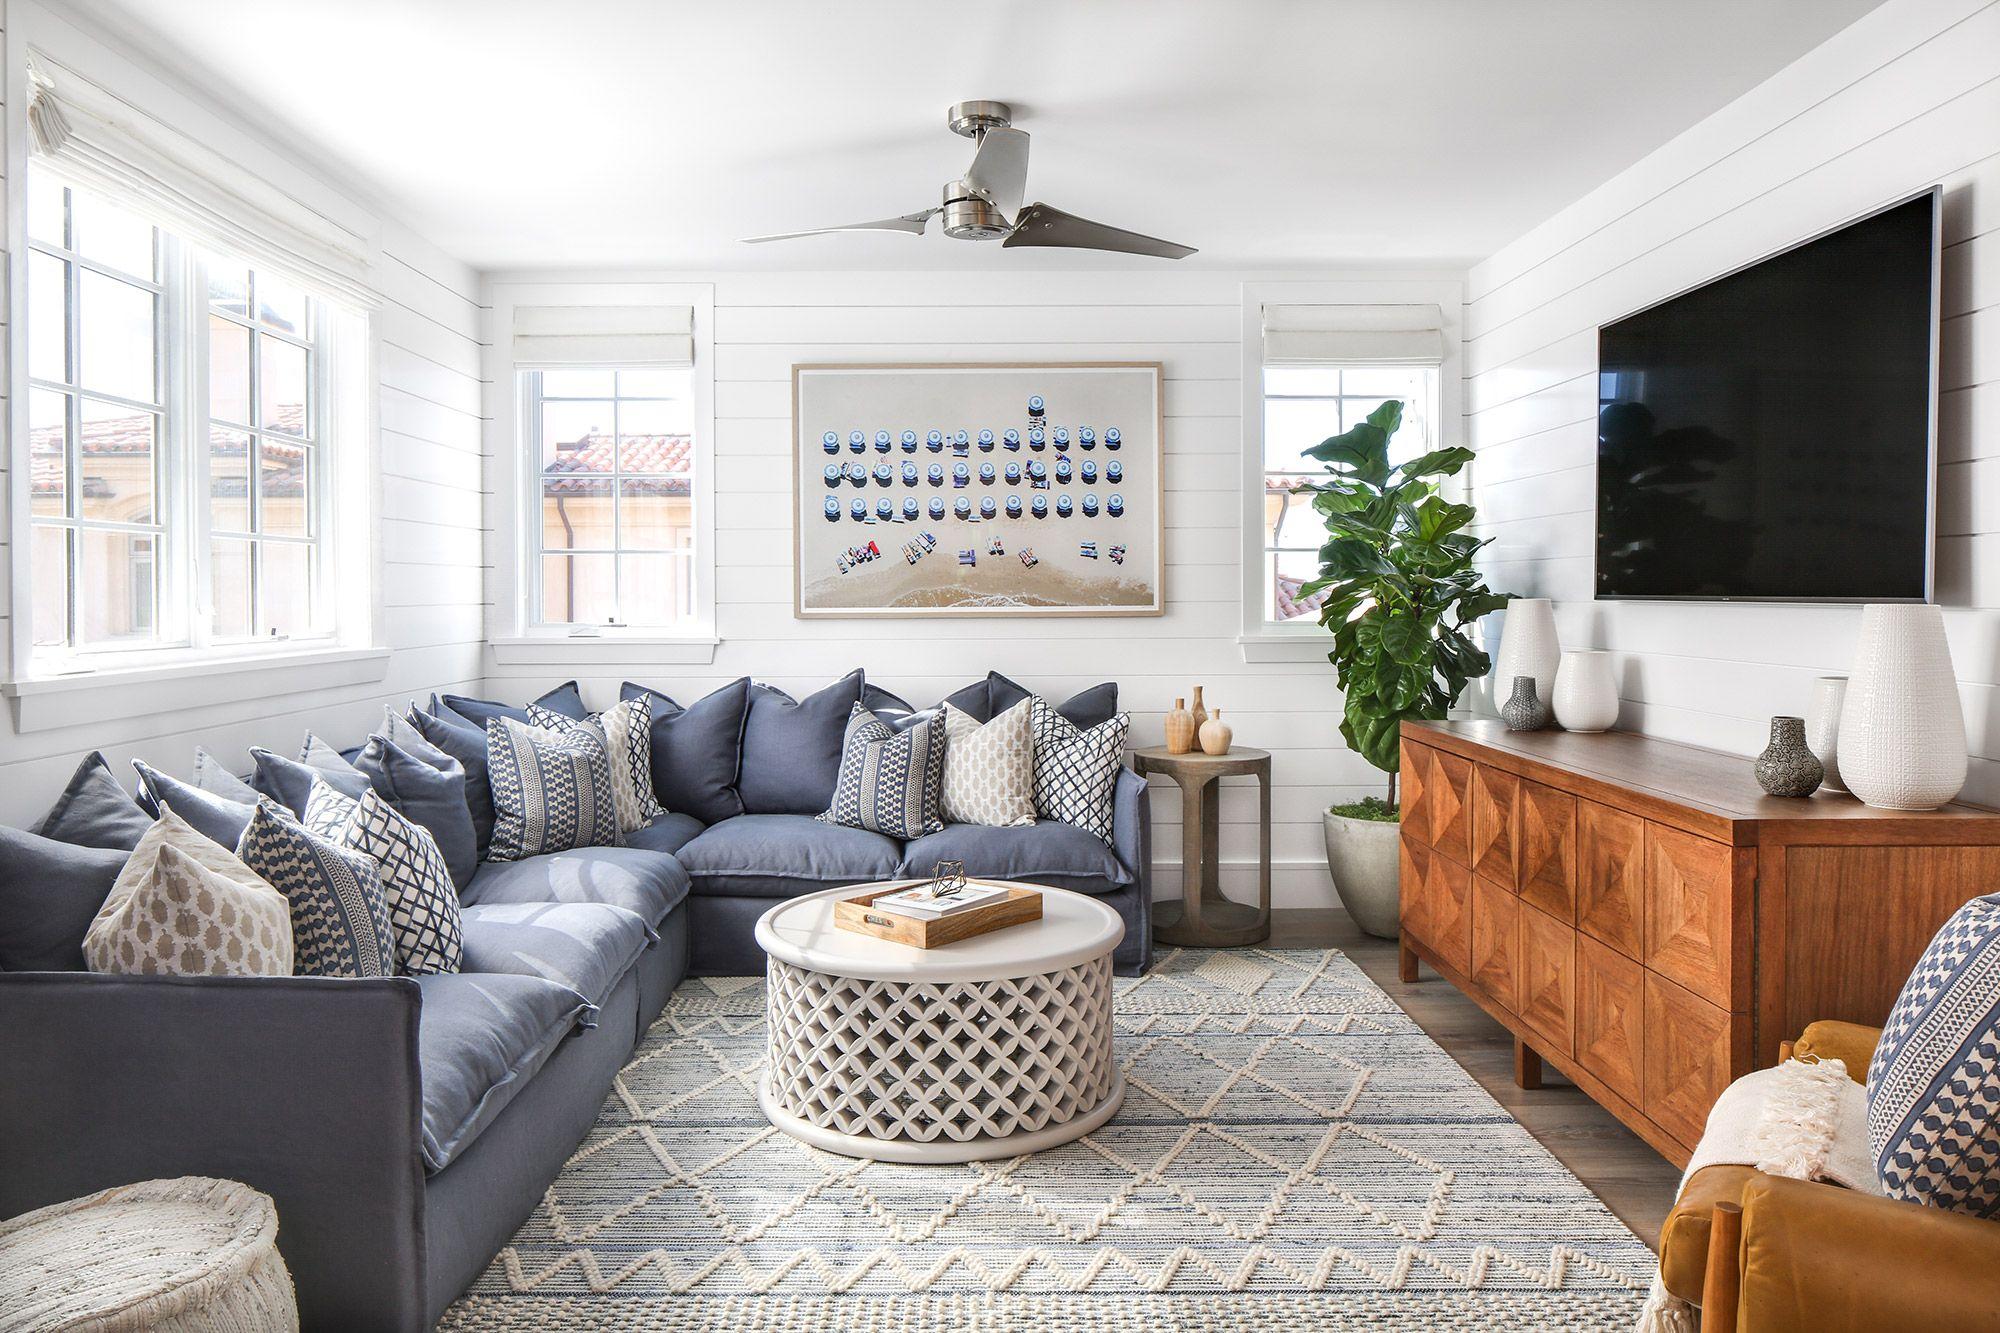 8 Popular Ways to Upgrade Your Furniture